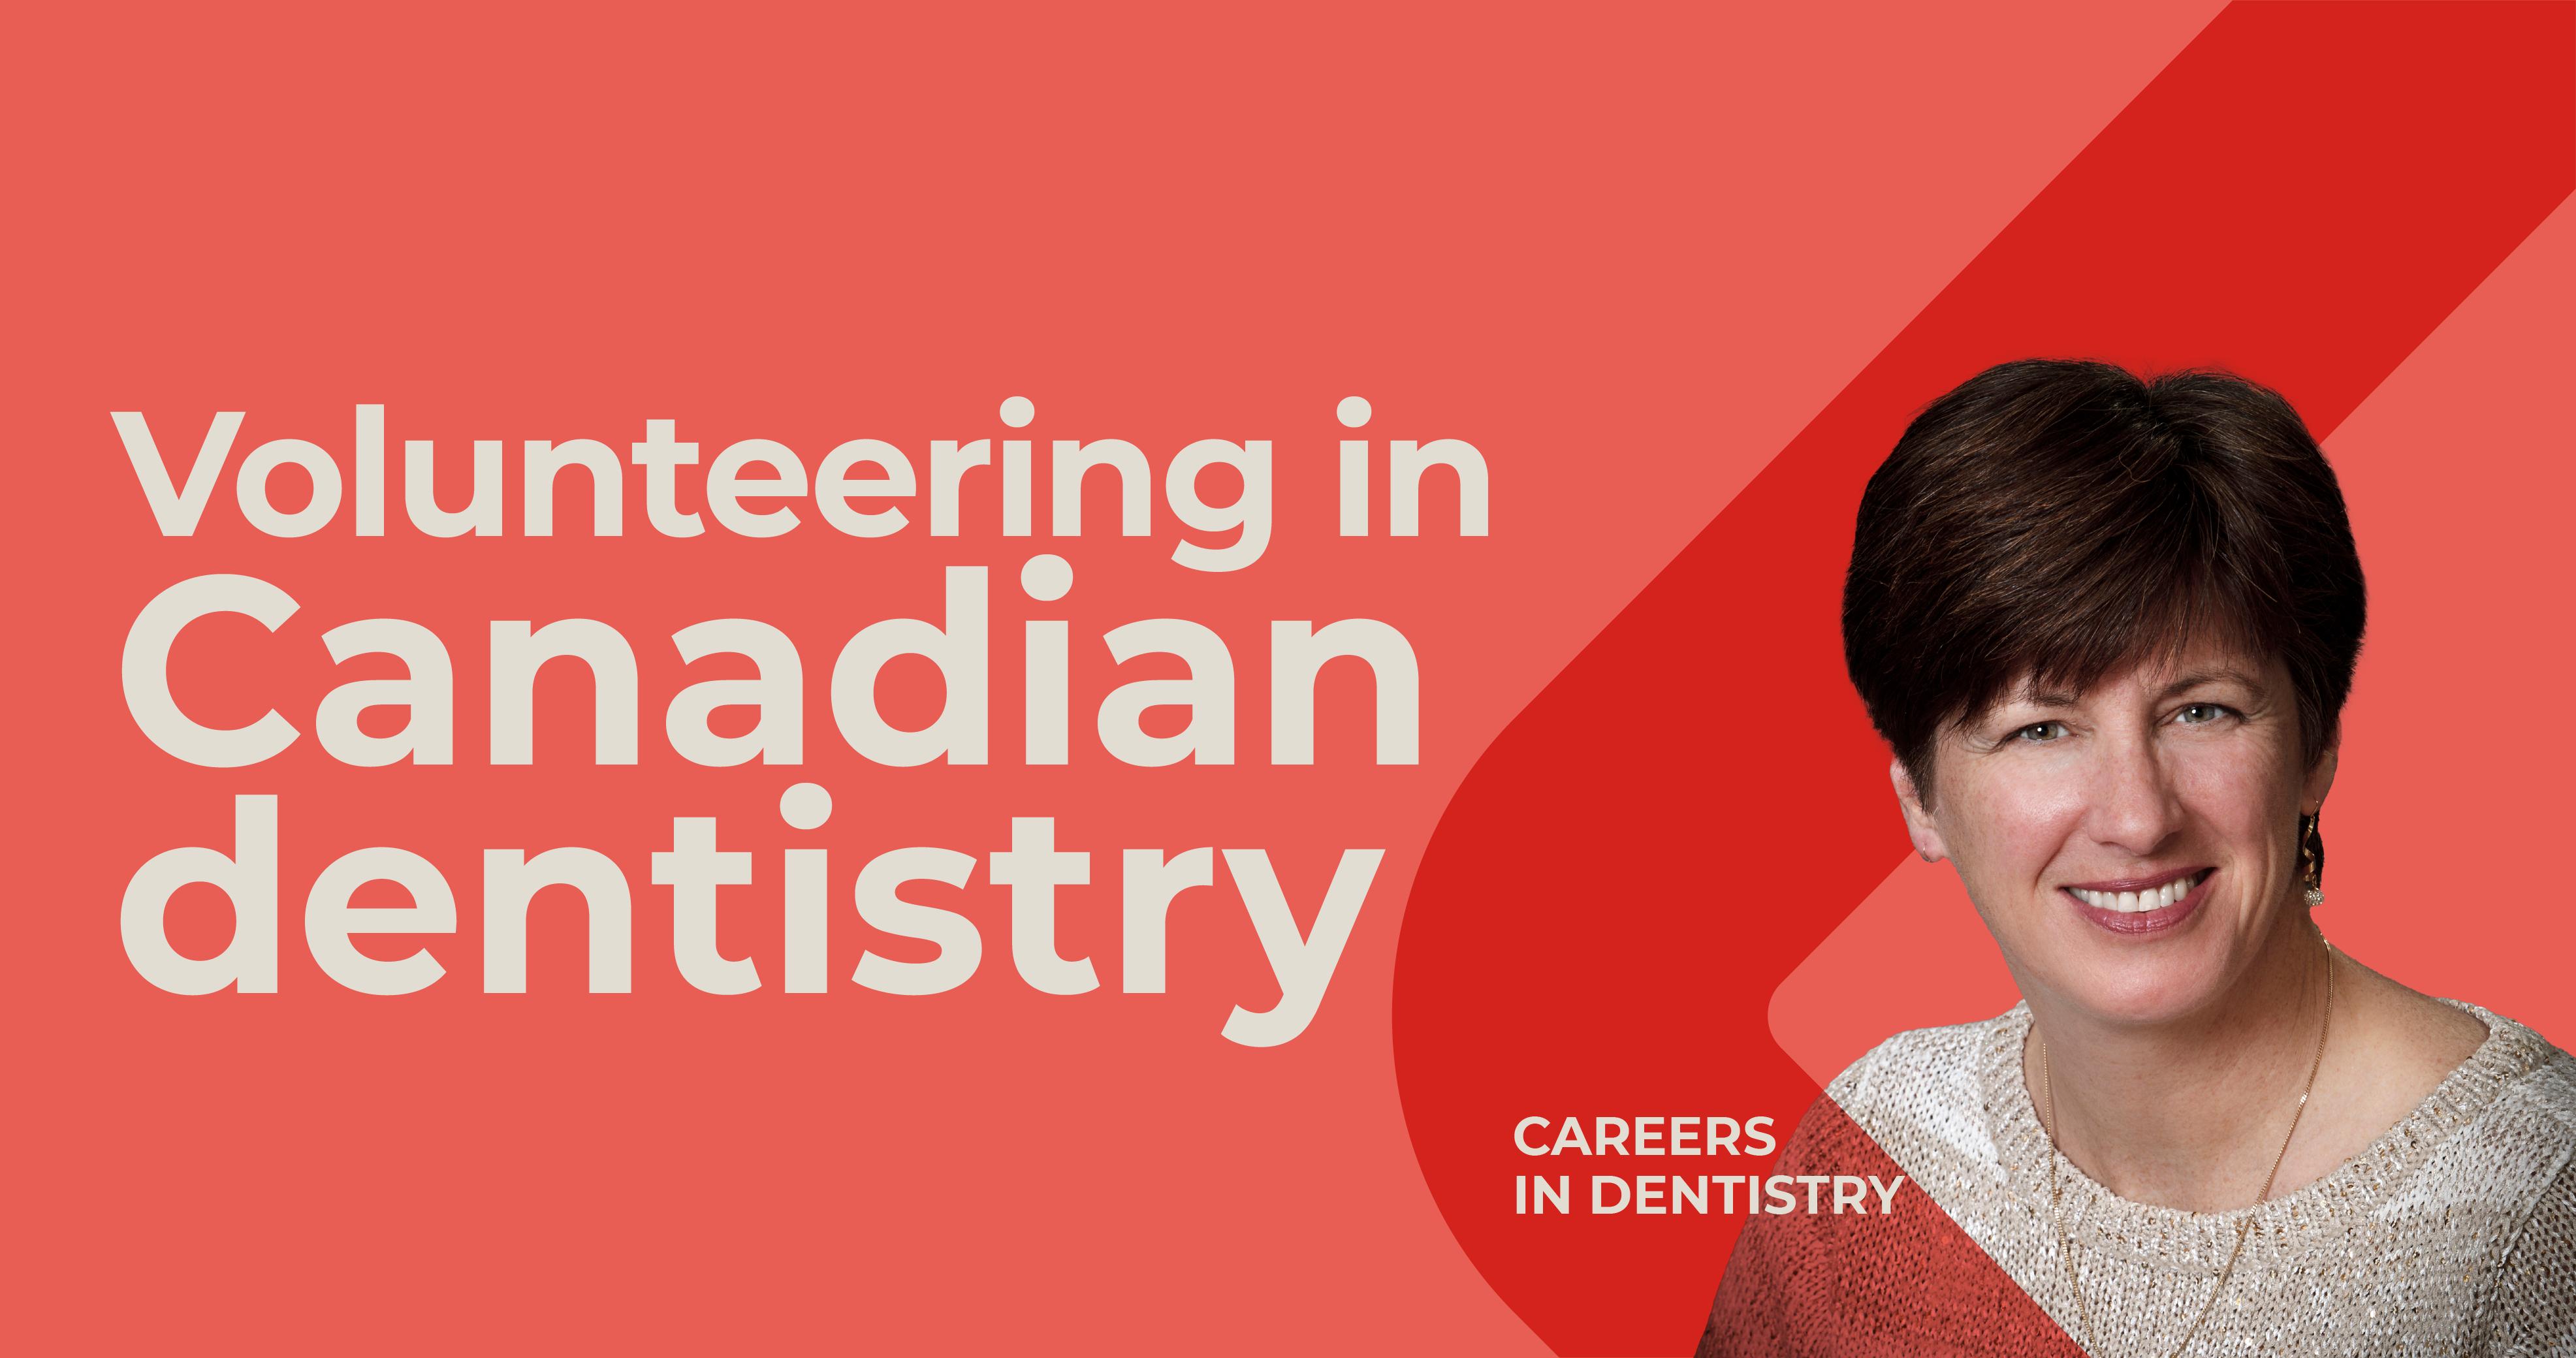 Careers in Dentistry Series Dr. Pennie Thornton on volunteering as a dentist in Canada